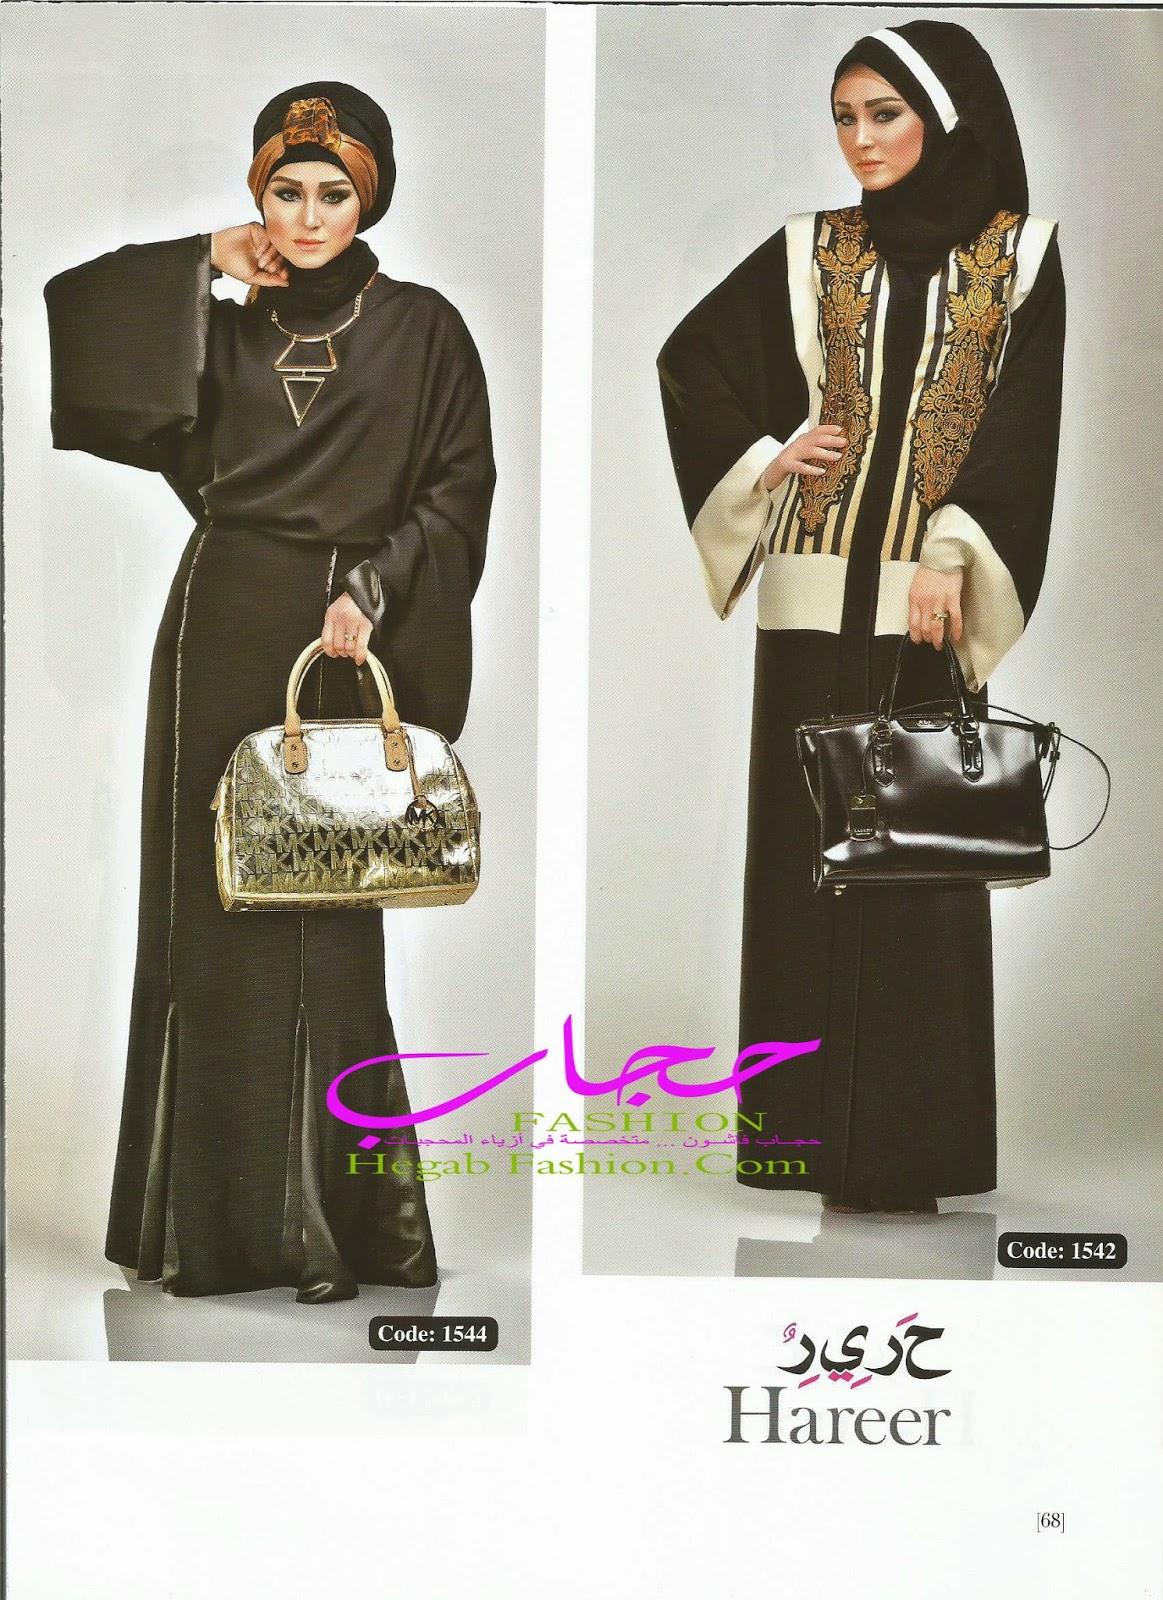 e30865a2cd293 مجلة حجاب فاشون - Hijab Fashion Magazine  حجاب فاشون 2015